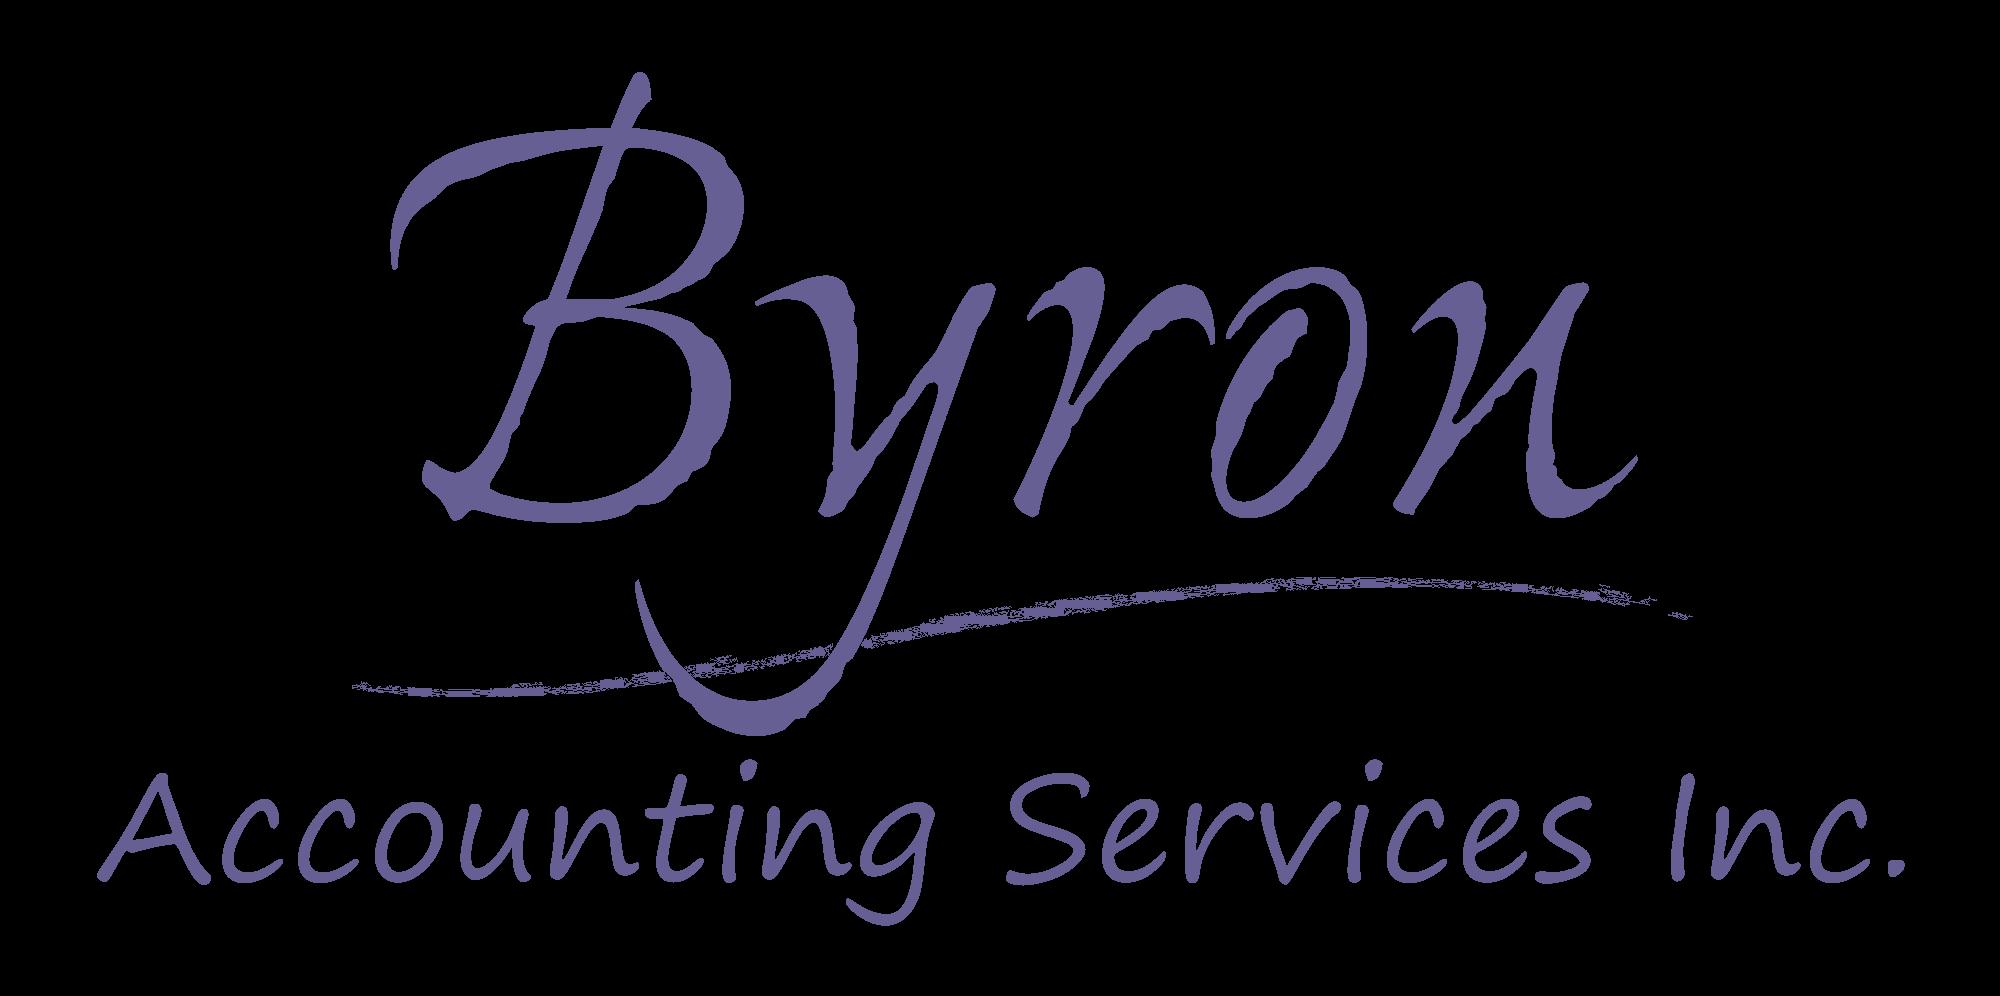 Byron Accounting